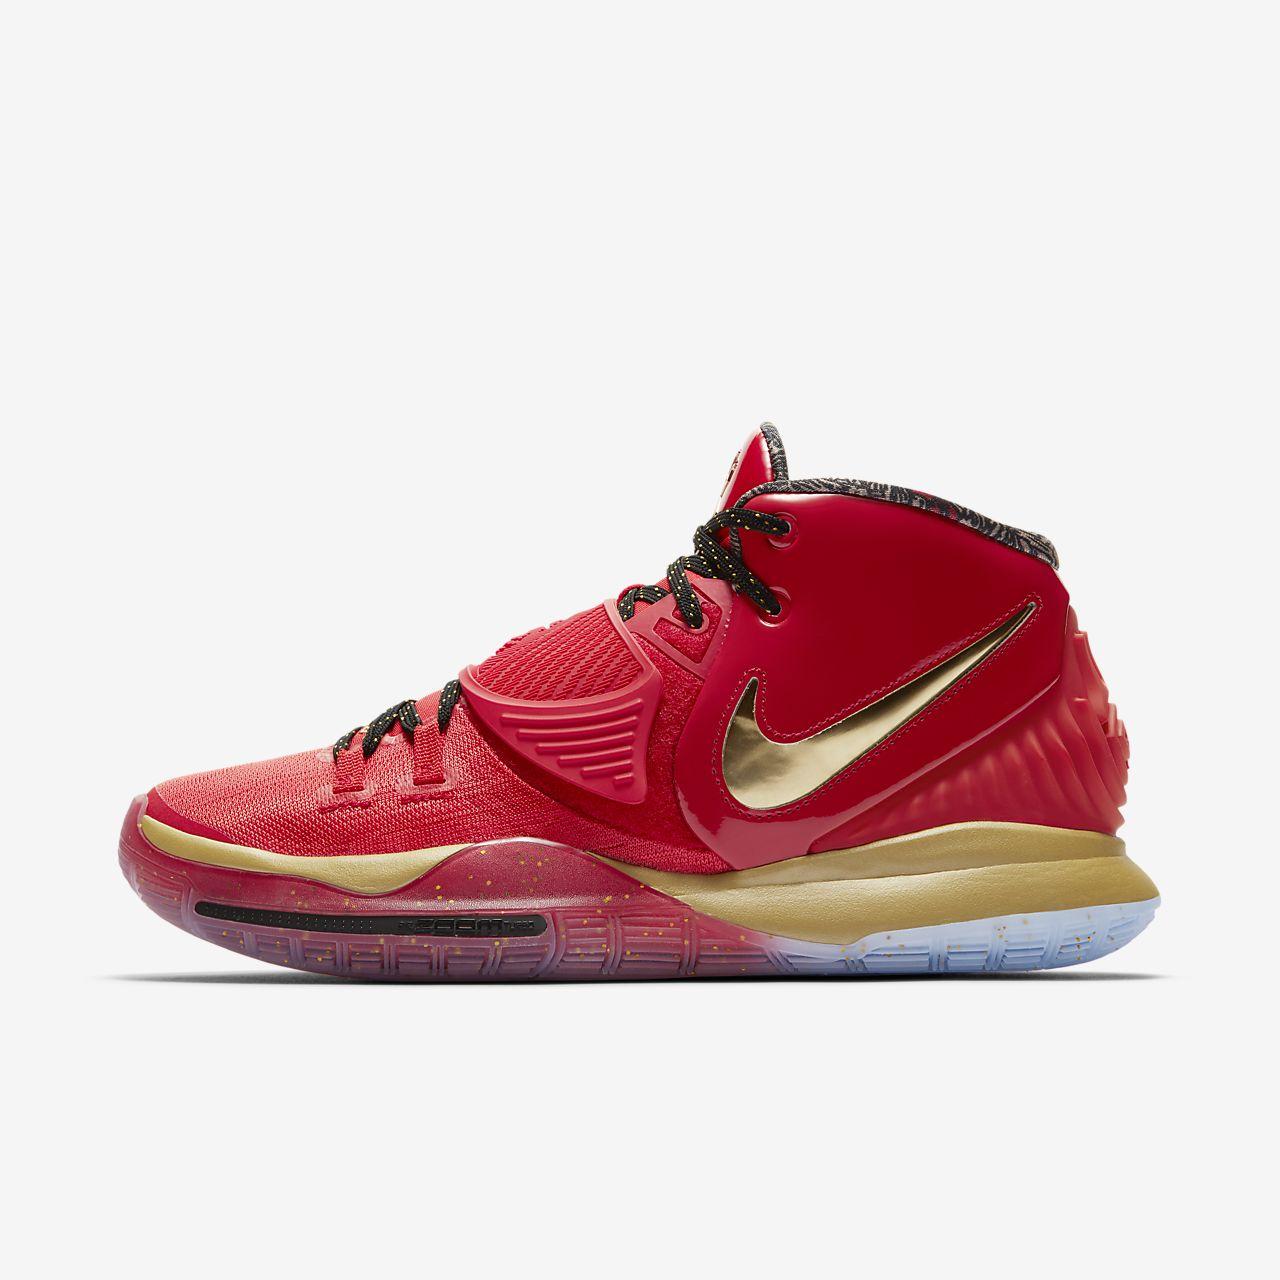 Kyrie 6 Trophies Basketball Shoe